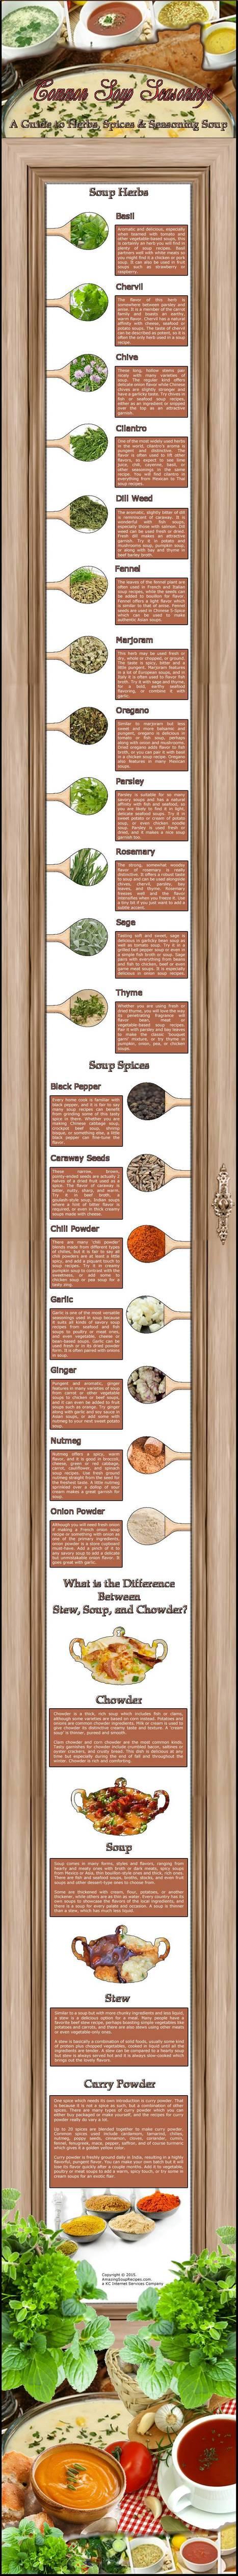 Common Soup Seasonings   Amazing Soup Recipes   Scoop.it